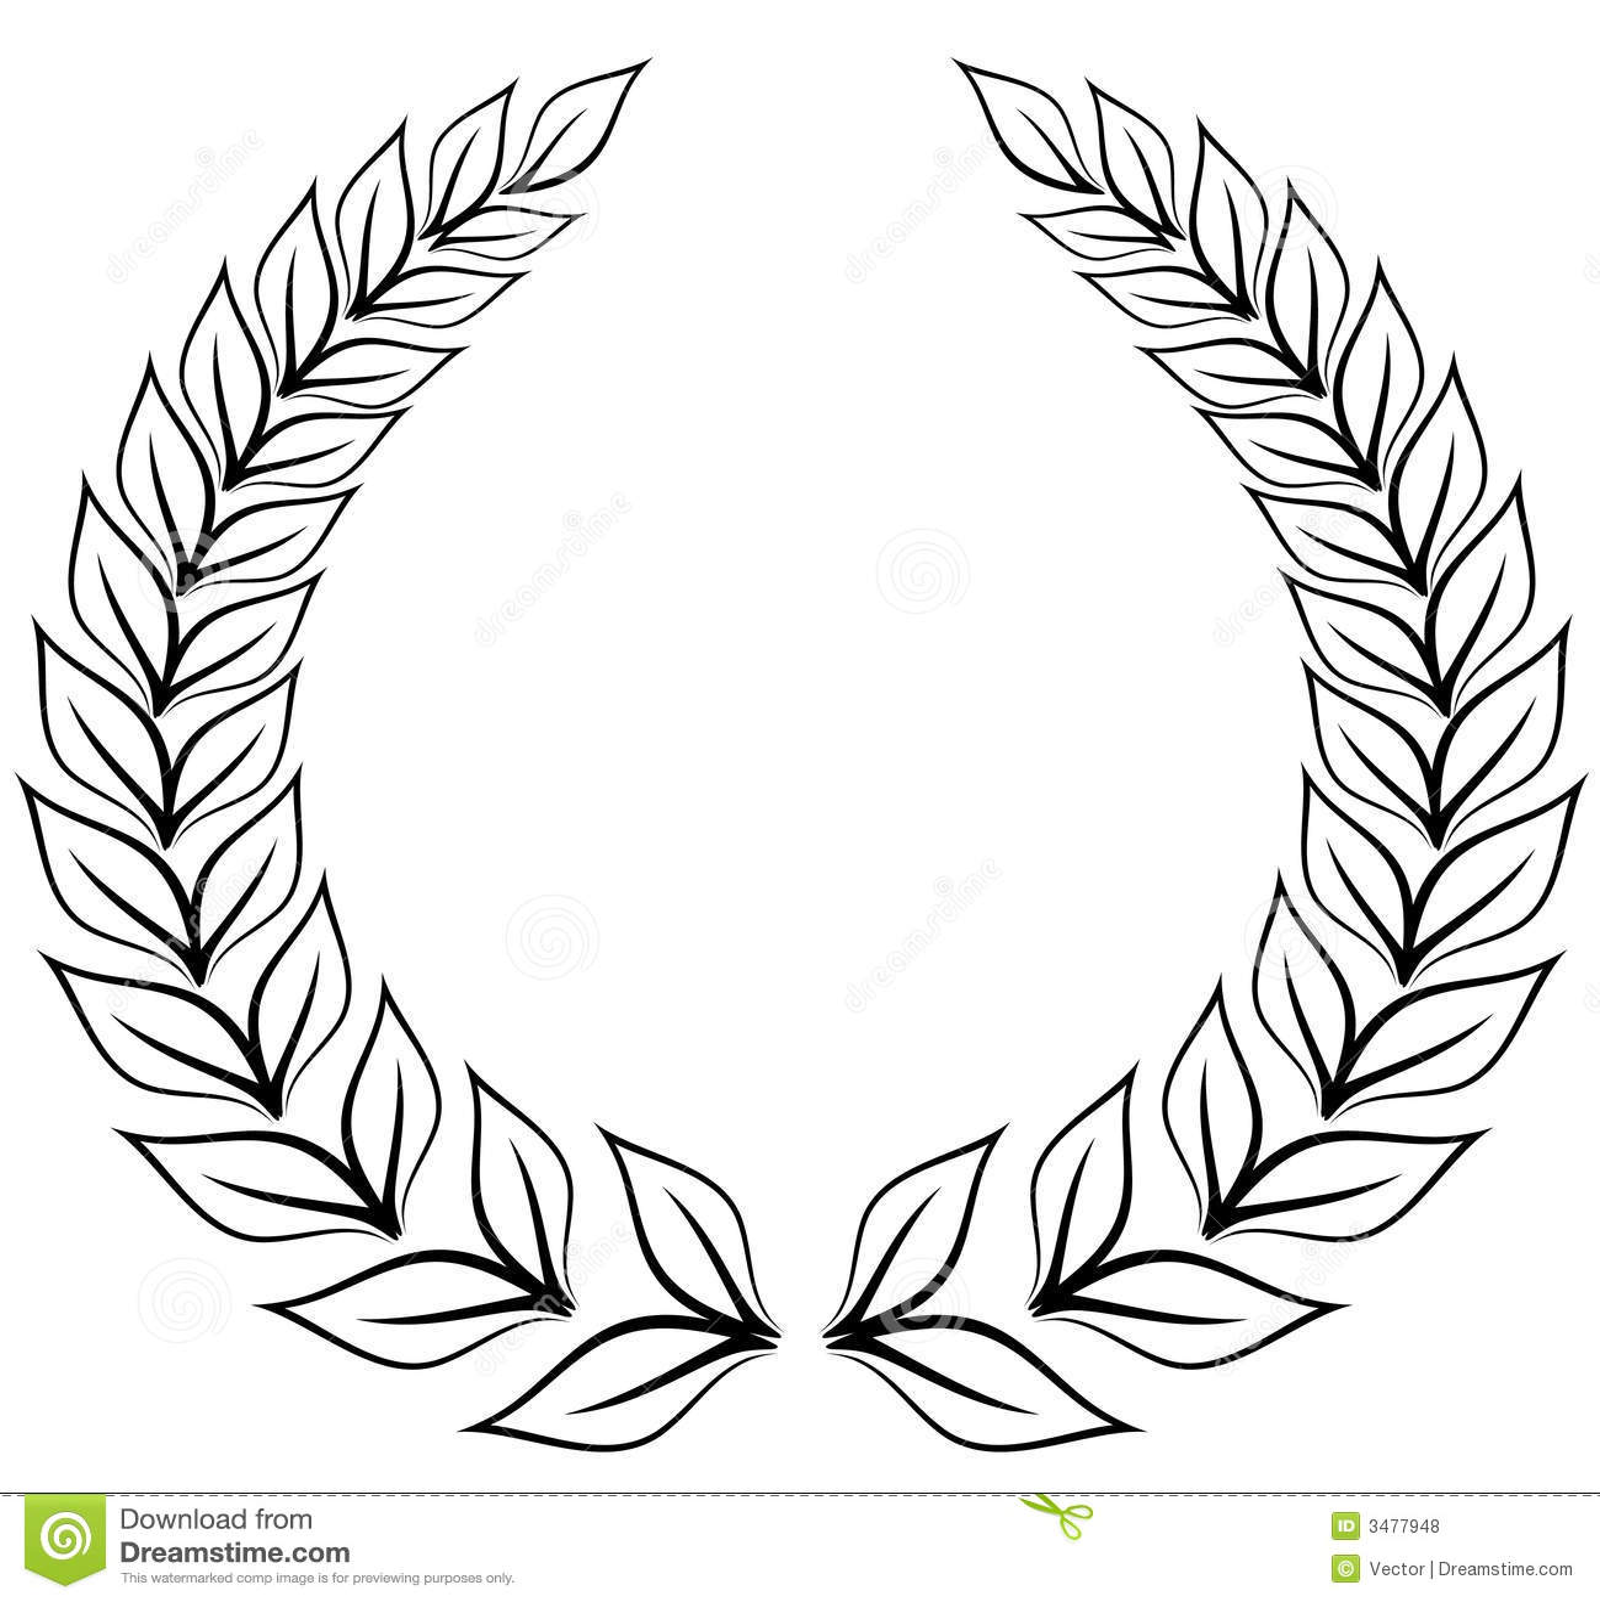 Laurel Wreath Royalty Free Stock Photos Image 3477948